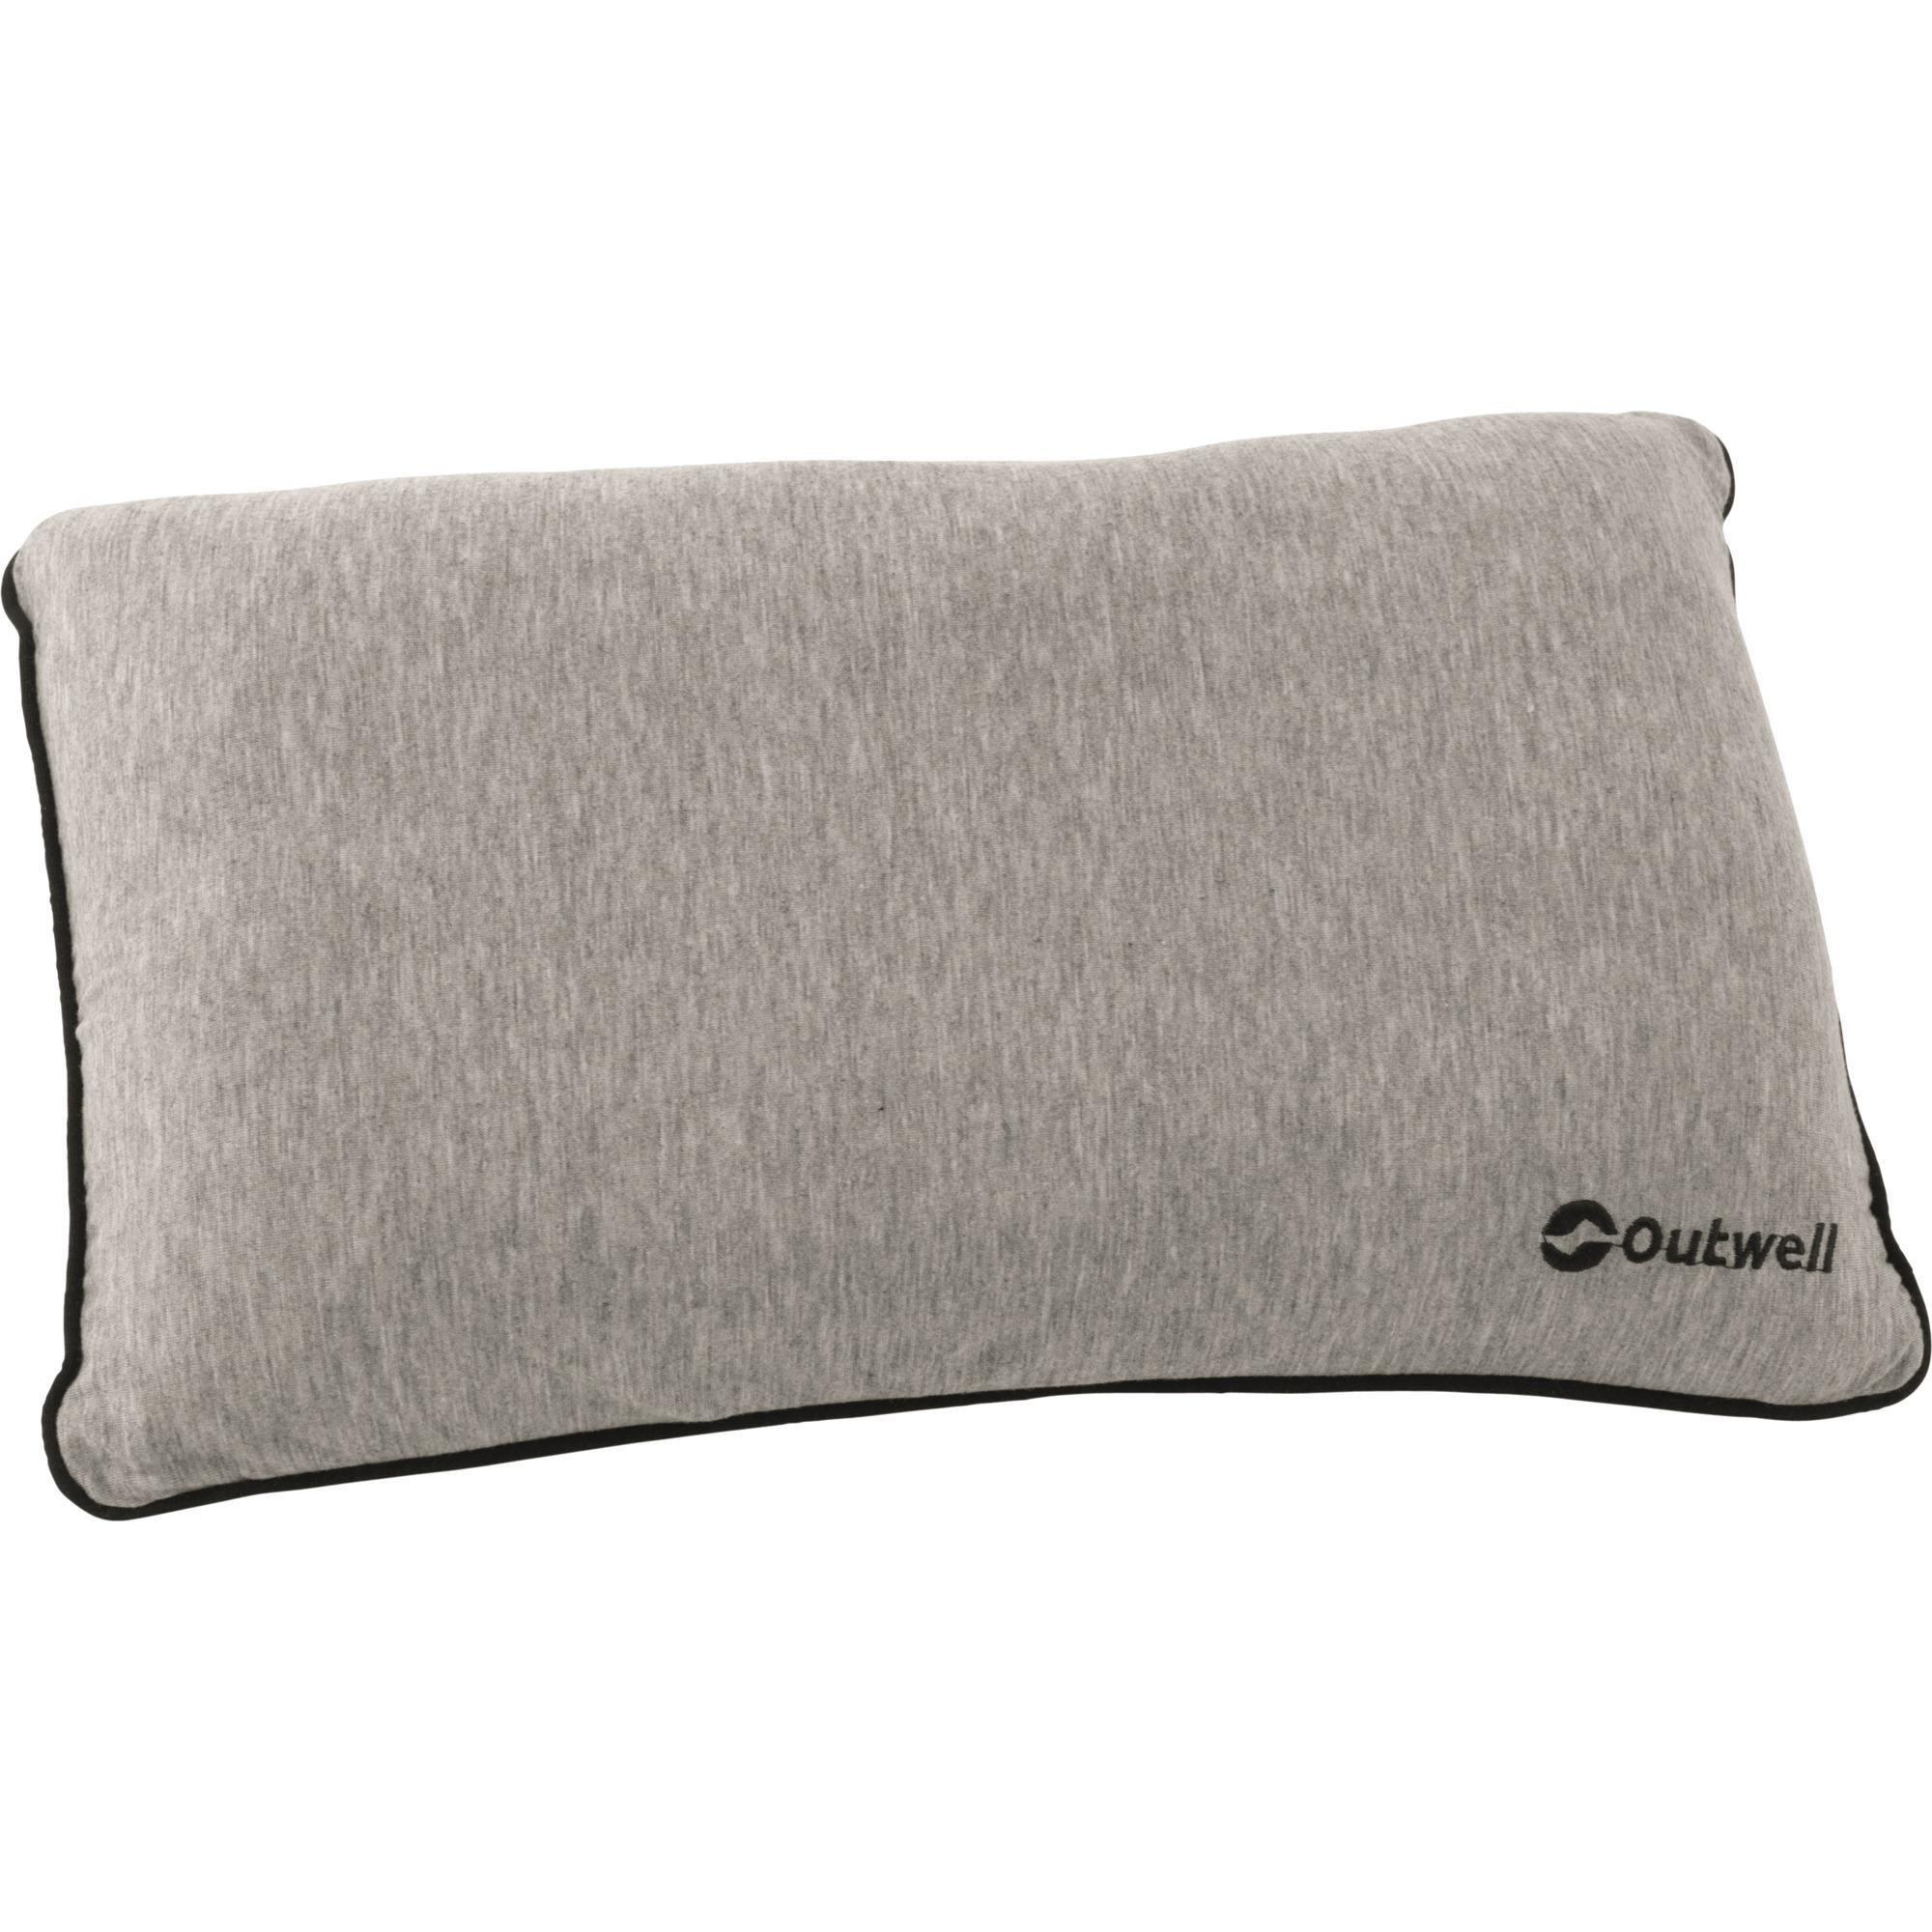 Memory almohadas para camping